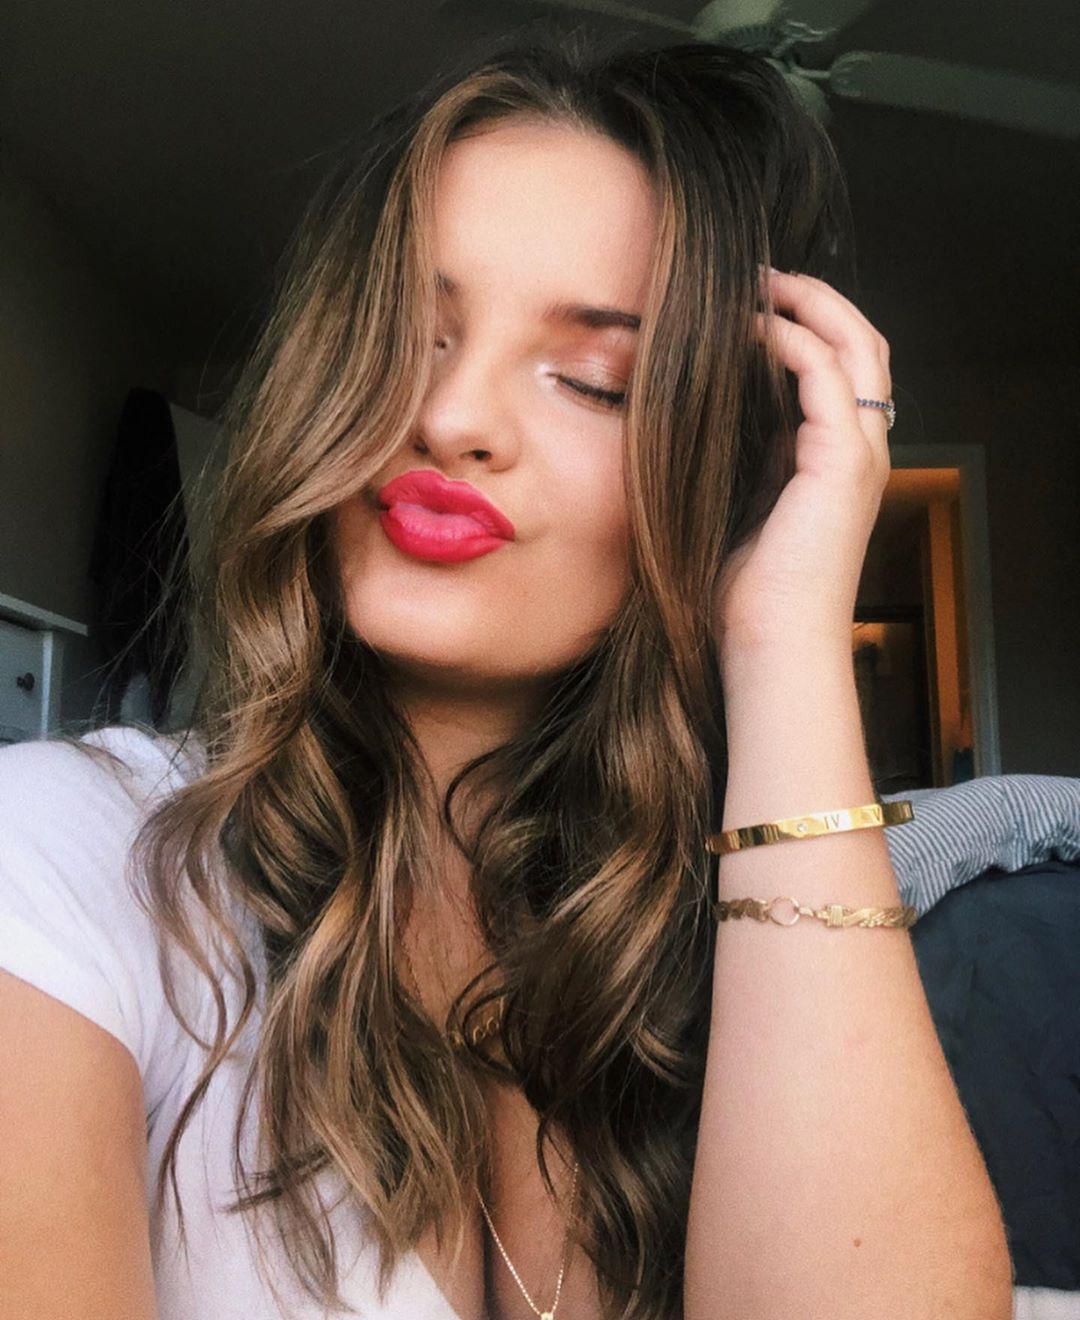 Brooke Hyland age